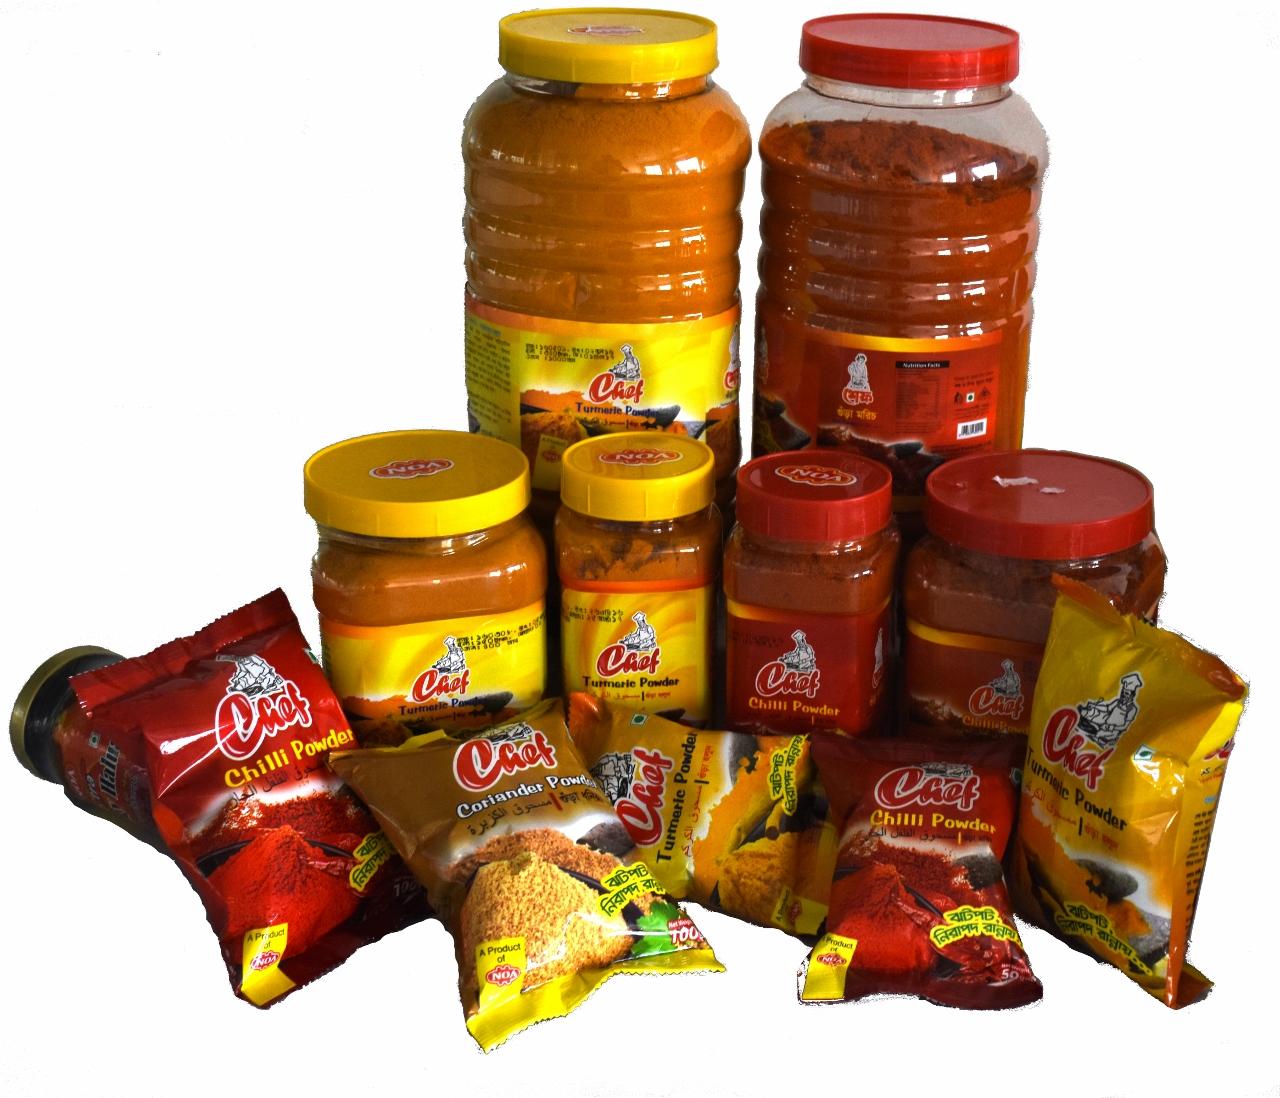 Chef Spice: Chilli Powder, Turmeric Powder,Coriander Powder